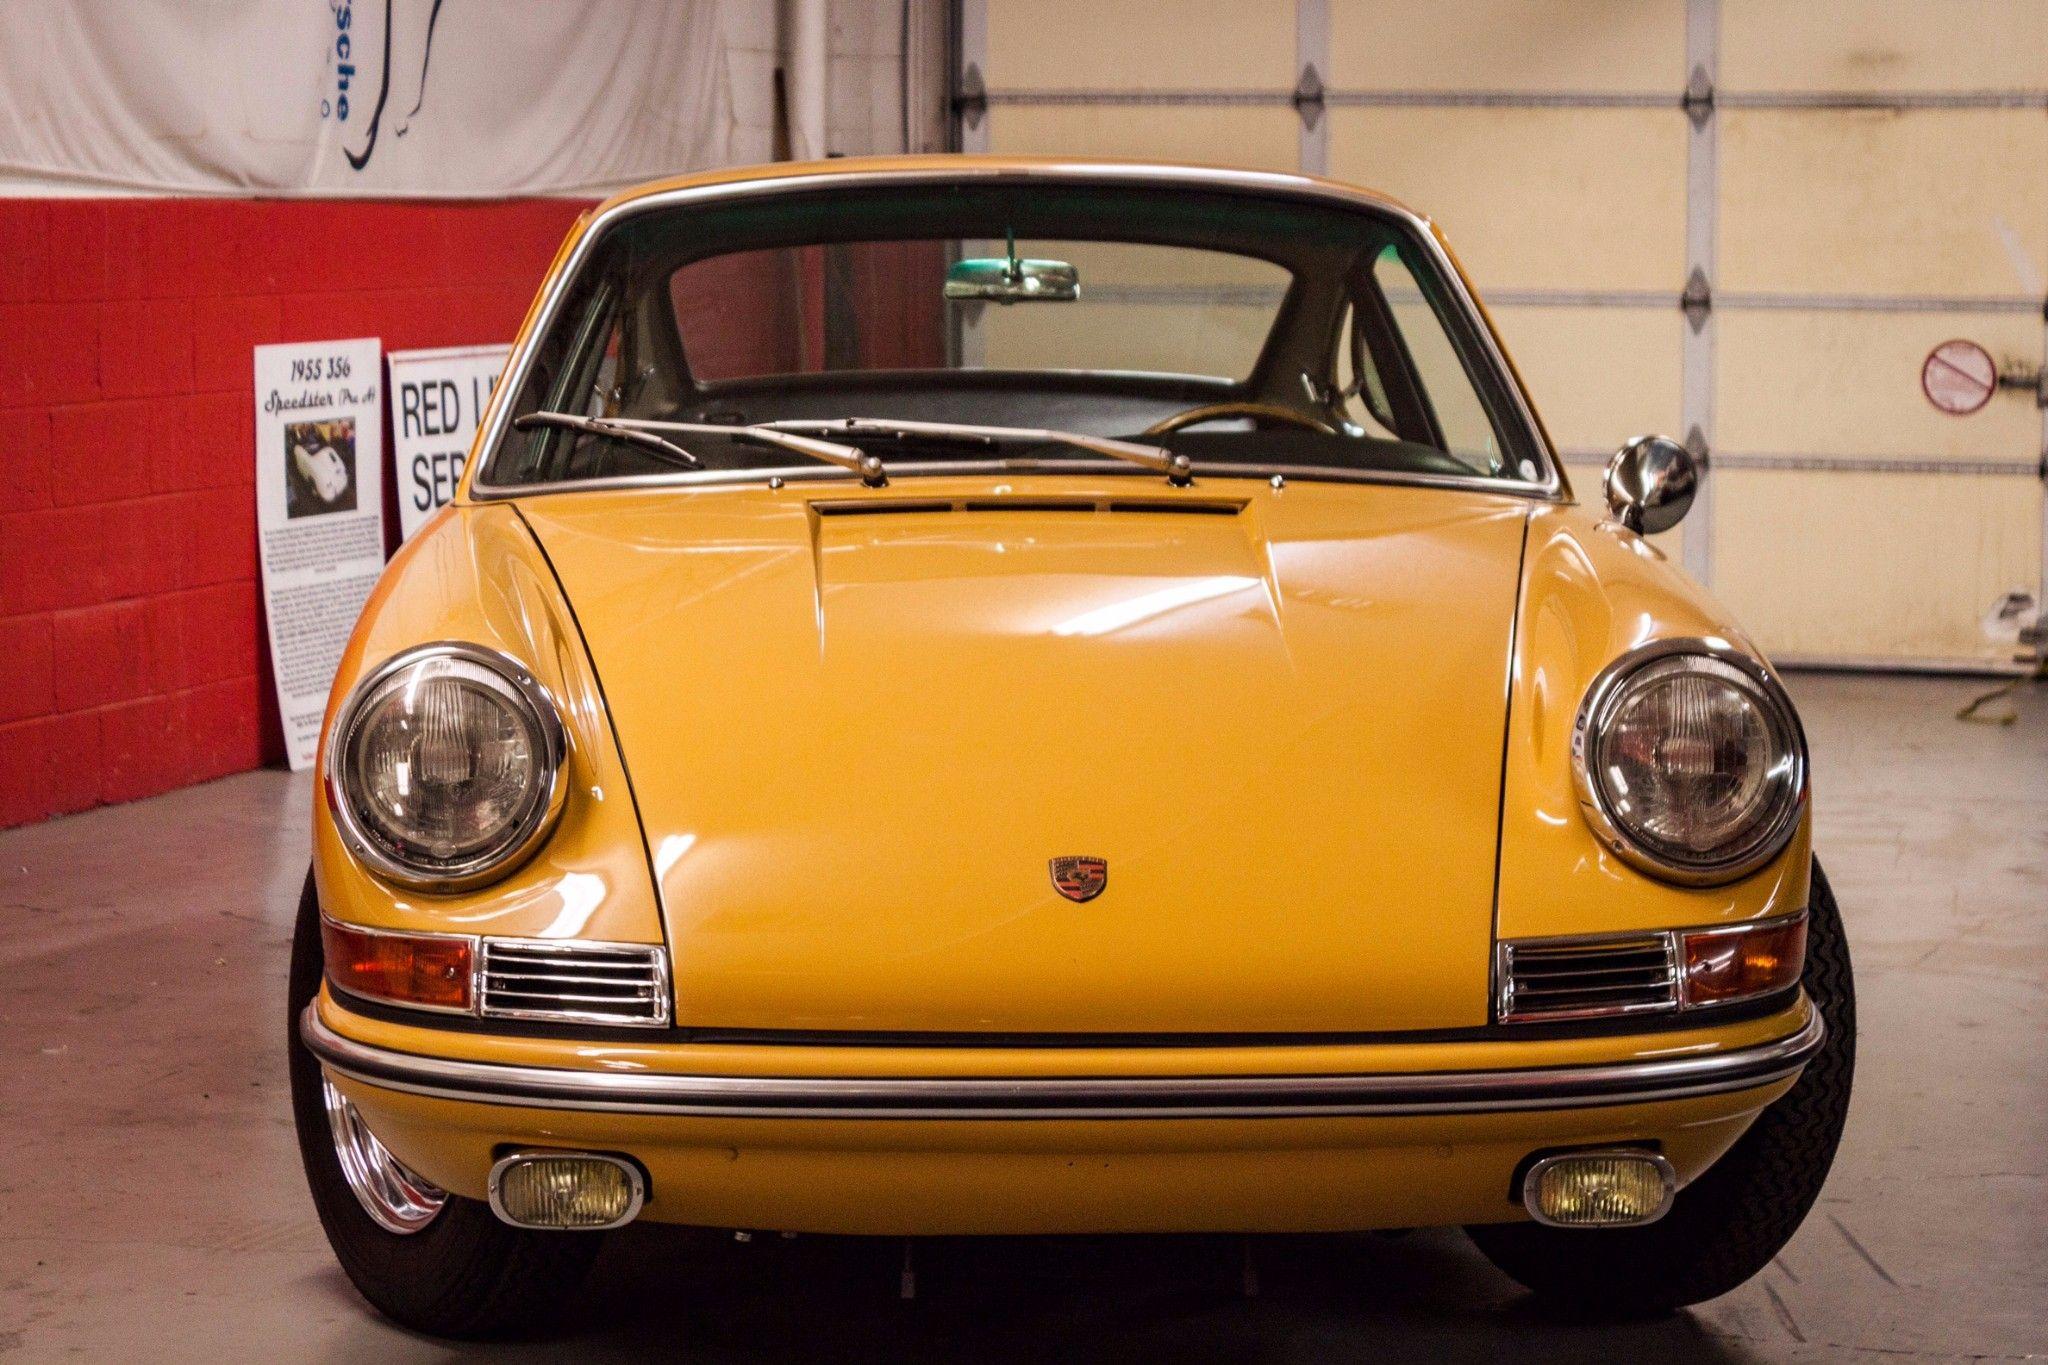 1985 mercedes benz 380sl for sale in reno tradenetautos stock id - Irish Green Porsche 991 Targa 0 600x330 Irish Green Porsches Pinterest Porsche 991 And Porsche 911